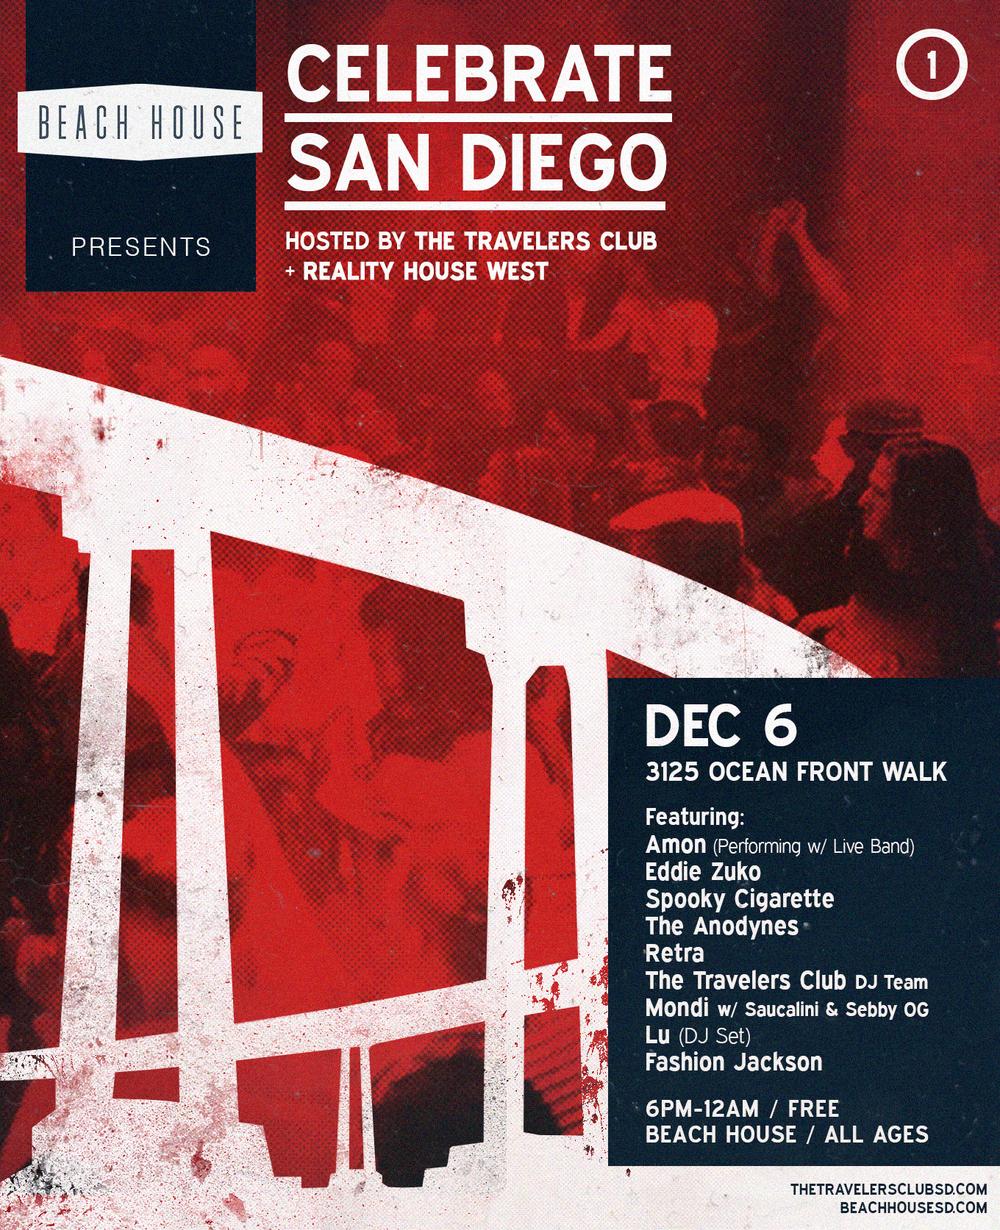 Celebrate San Diego, sponsored by Red Bull